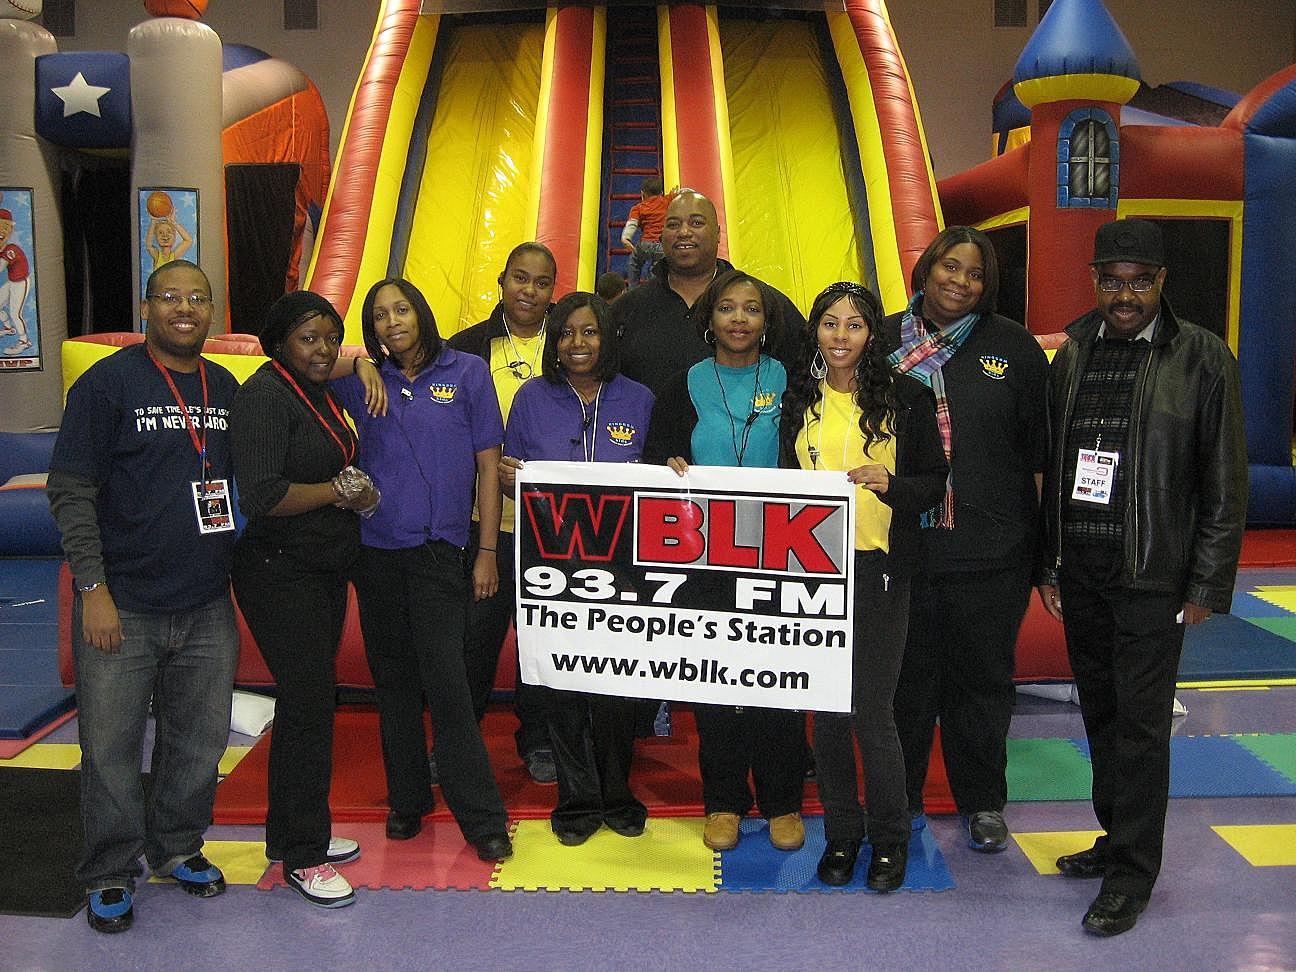 WBLK Visits The Kingdom Kids Family Fun Center